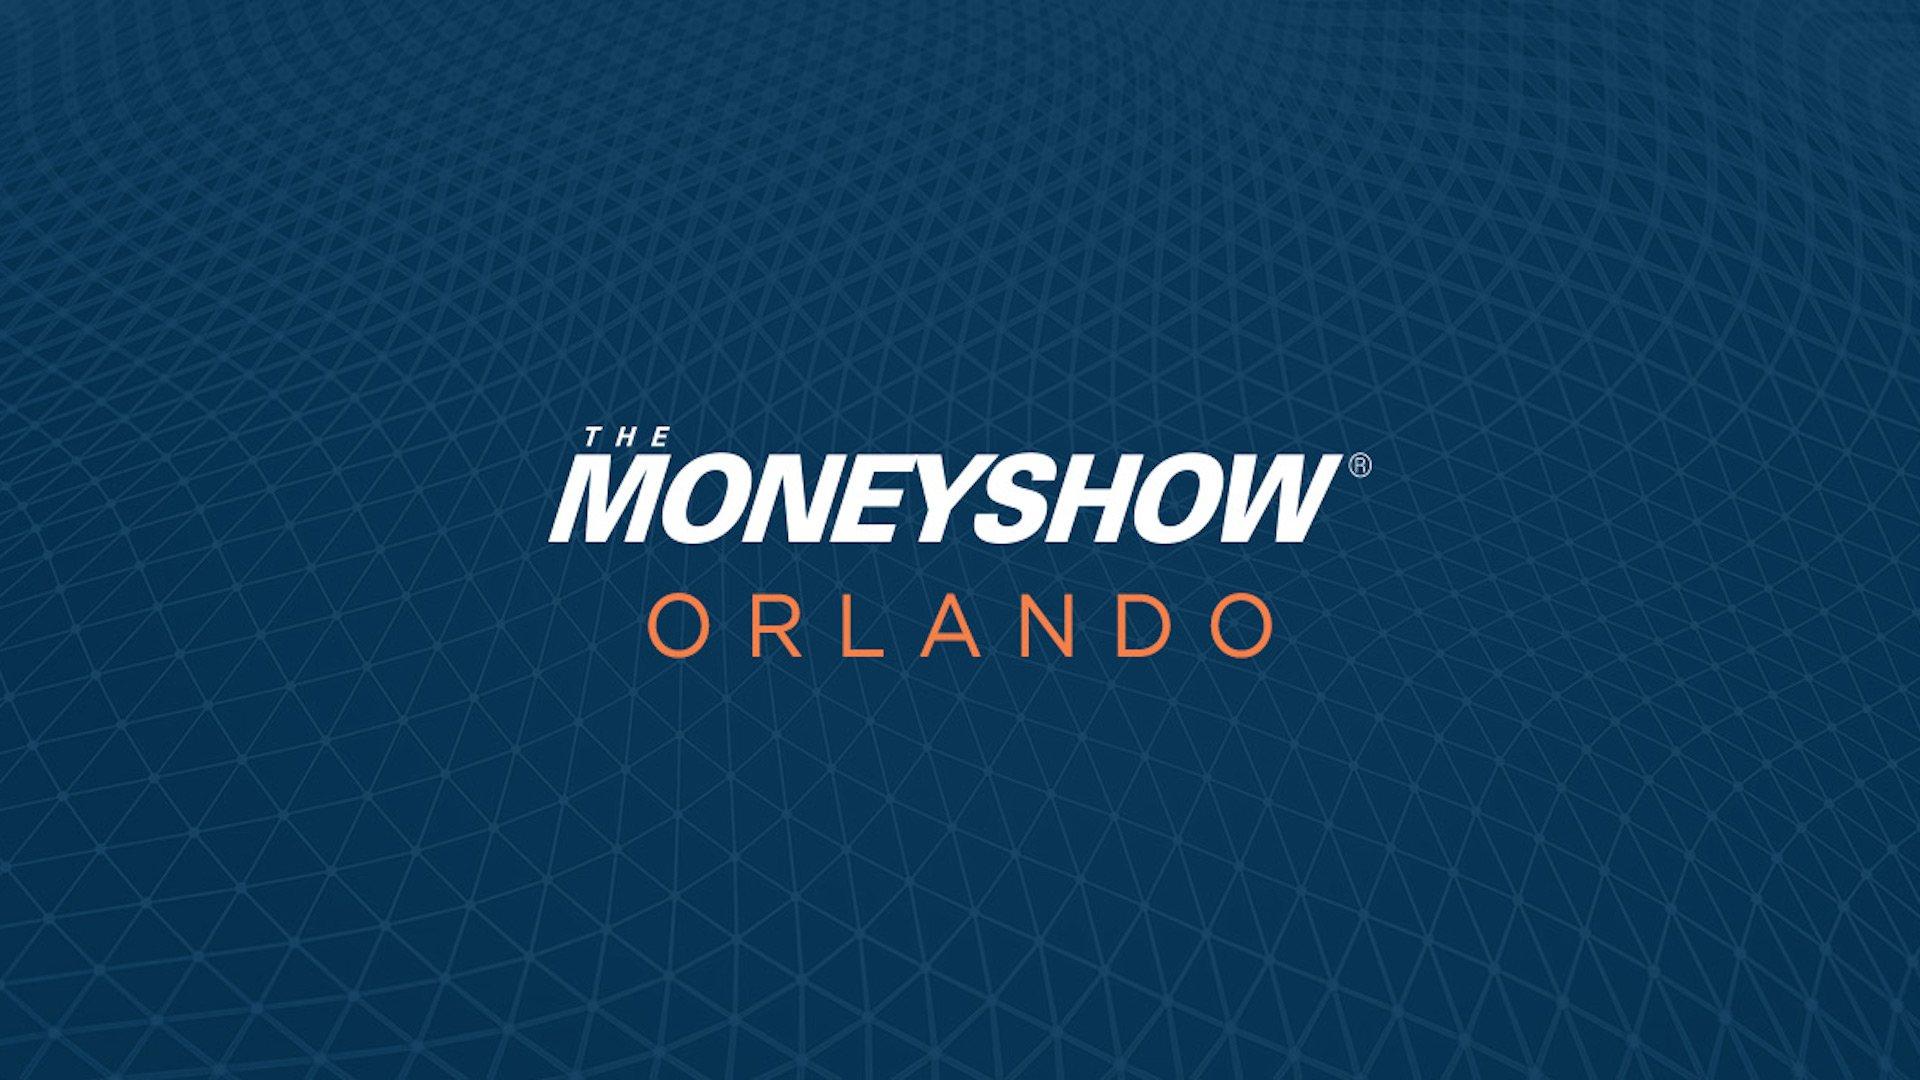 Tom Lee on the 2021 MoneyShow Orlando